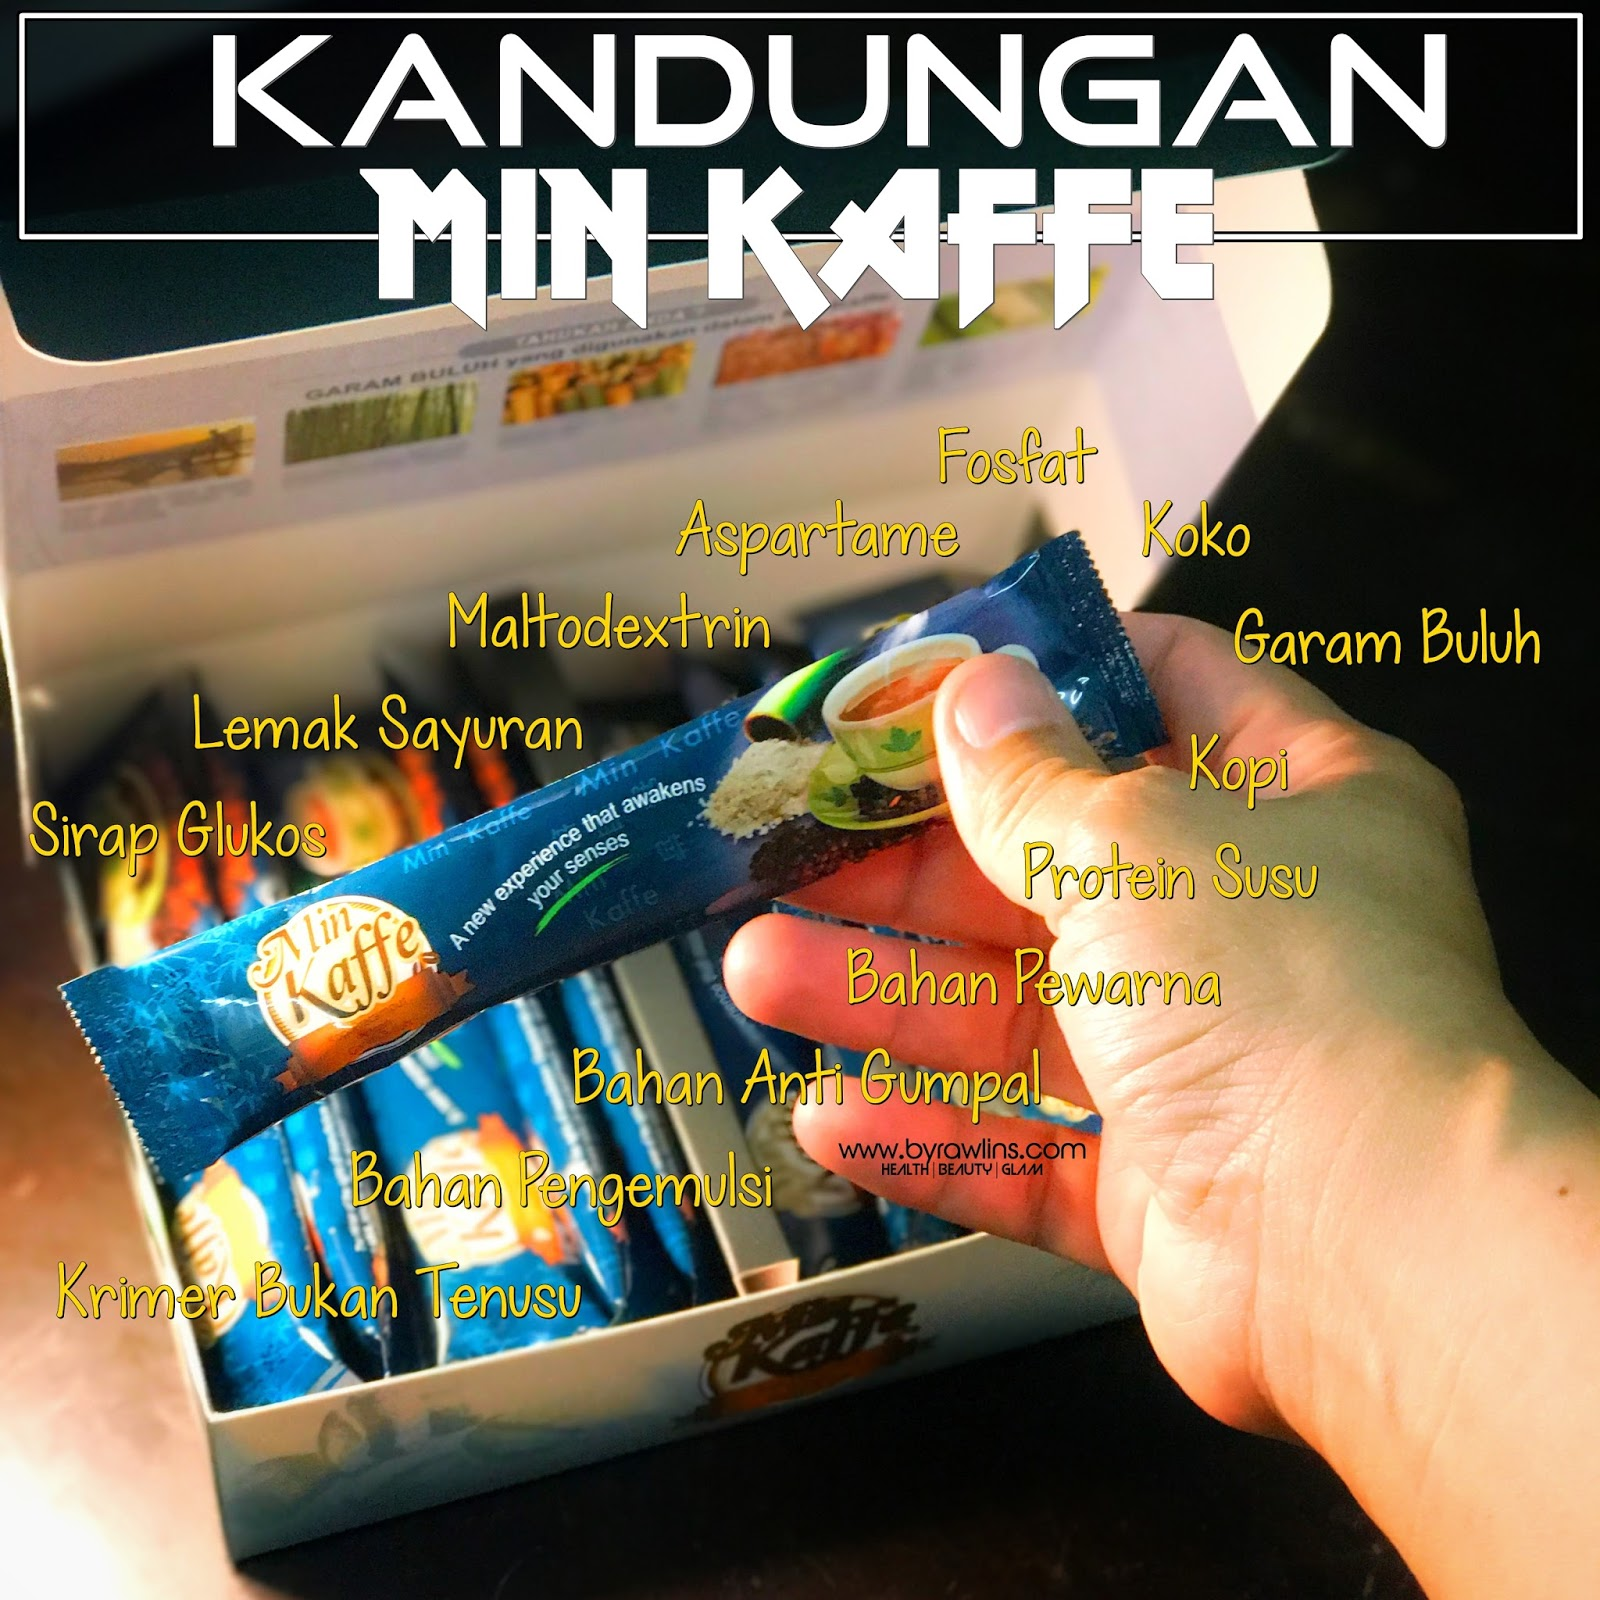 Min Kaffe, Mineral Coffee, Min Kaffe ingredients, Kopi Garam Buluh, Rawlins GLAM, Hanis Haizi Protege, Magnesium, Gila Kopi,